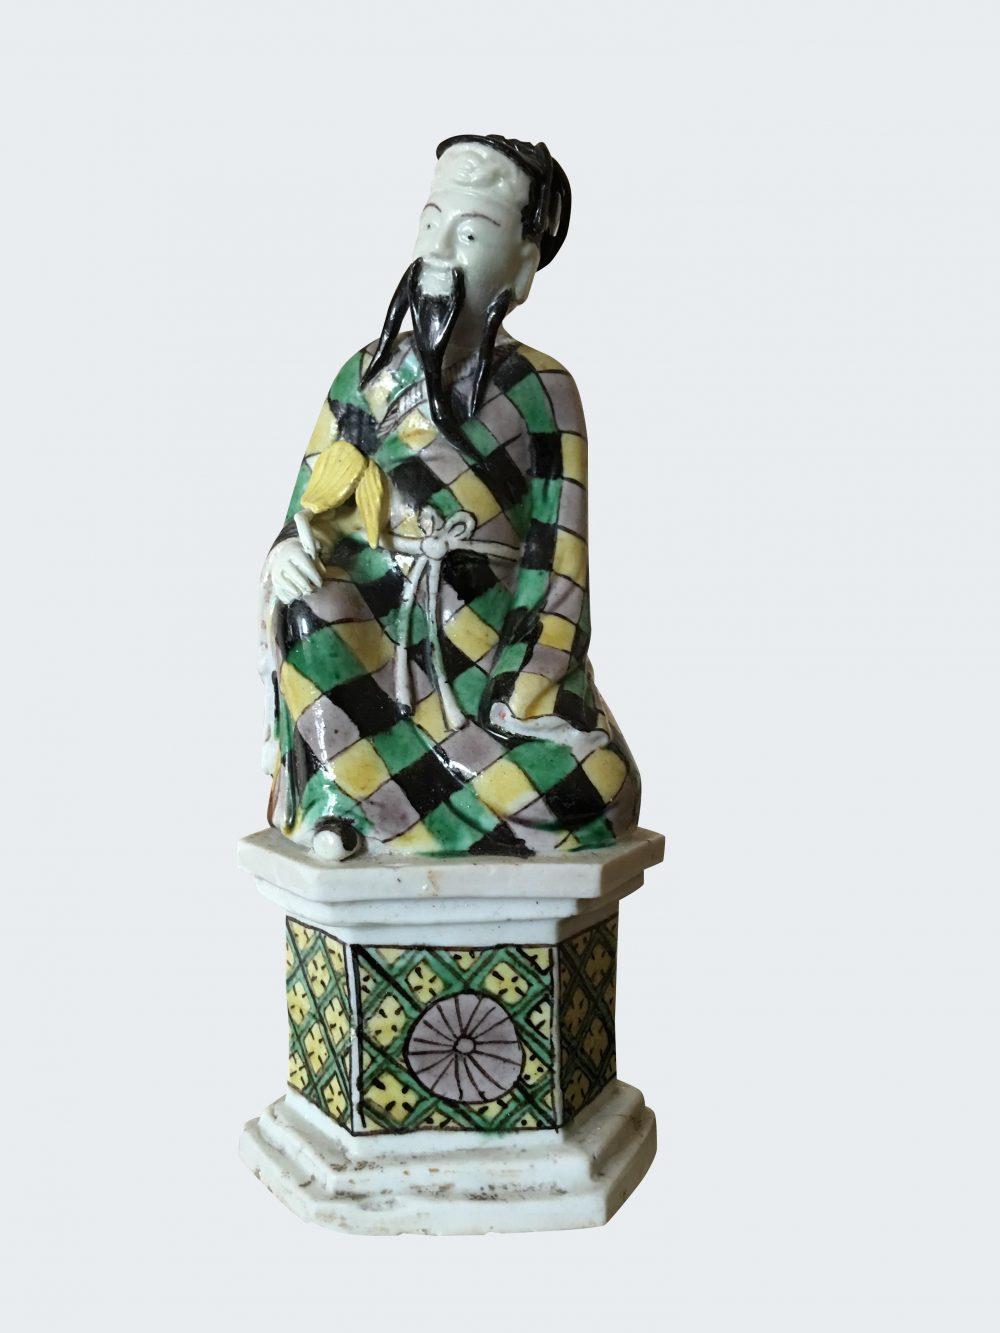 Porcelain Kangxi (1662-1722), early 18th century, China